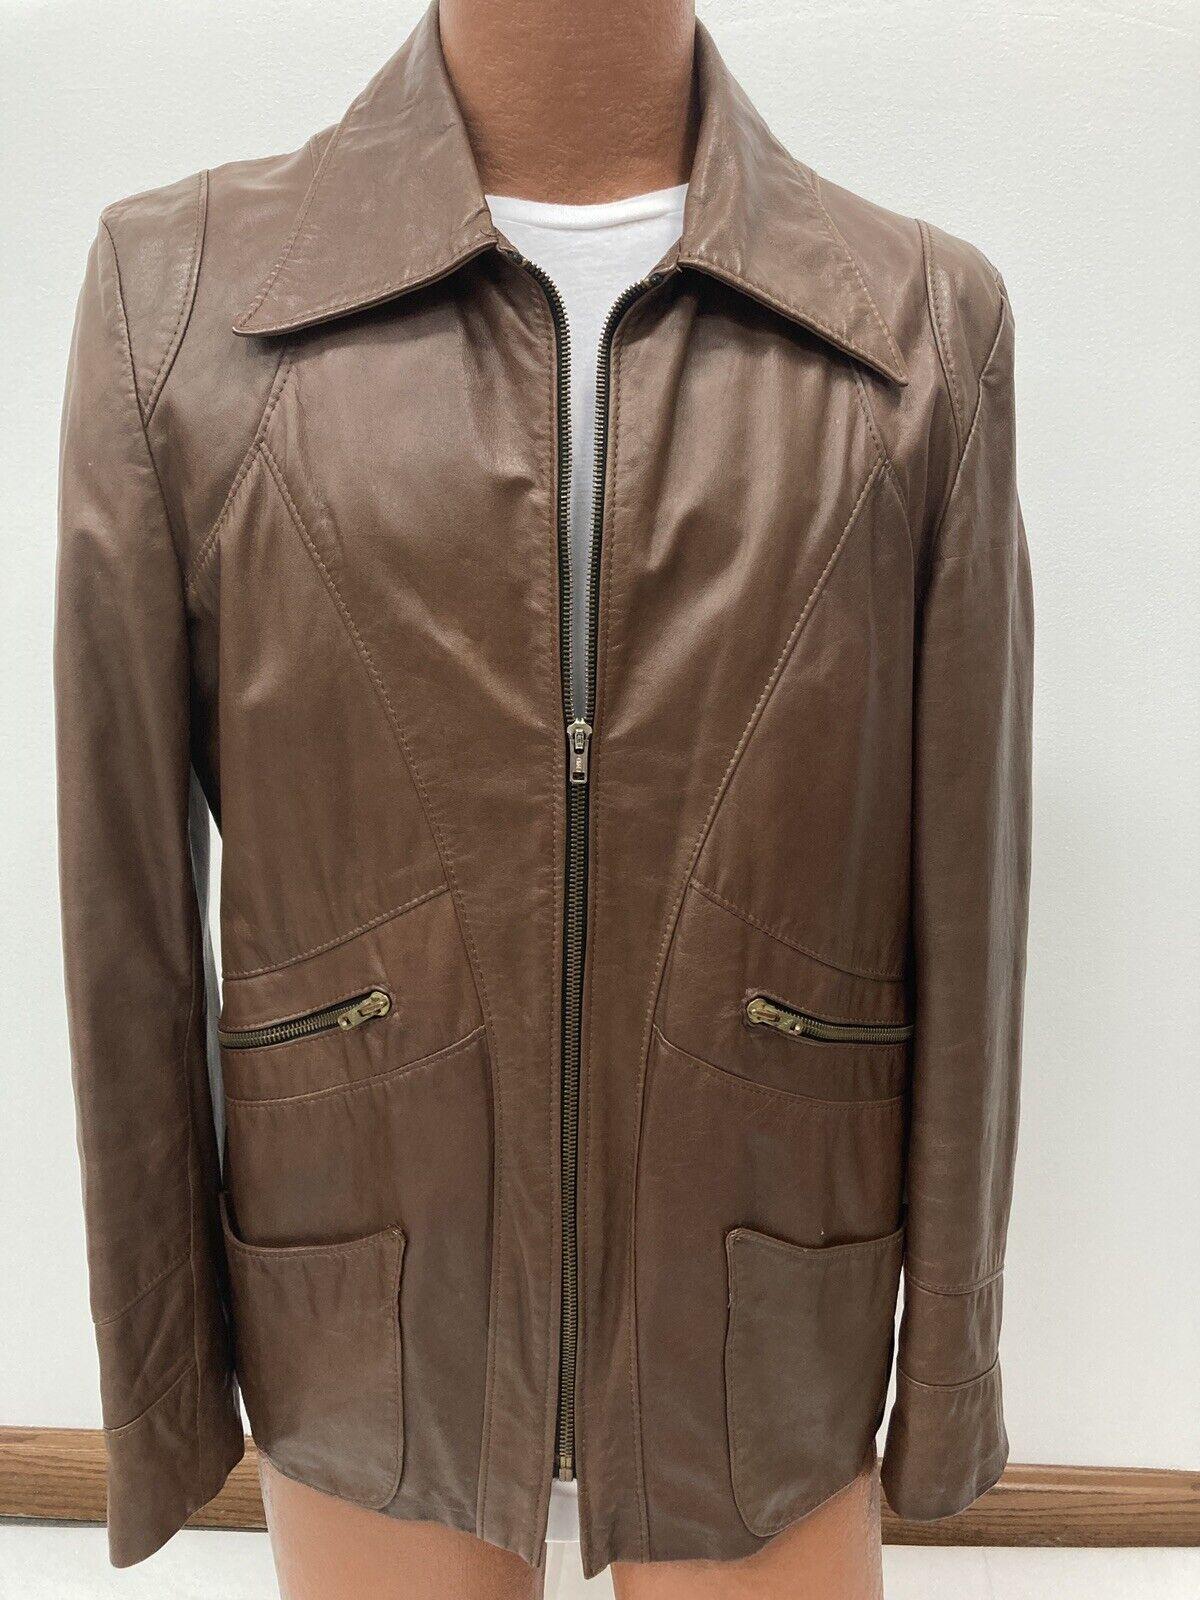 Genuine Vintage 1970s Brown Leather Blazer Jacket… - image 6